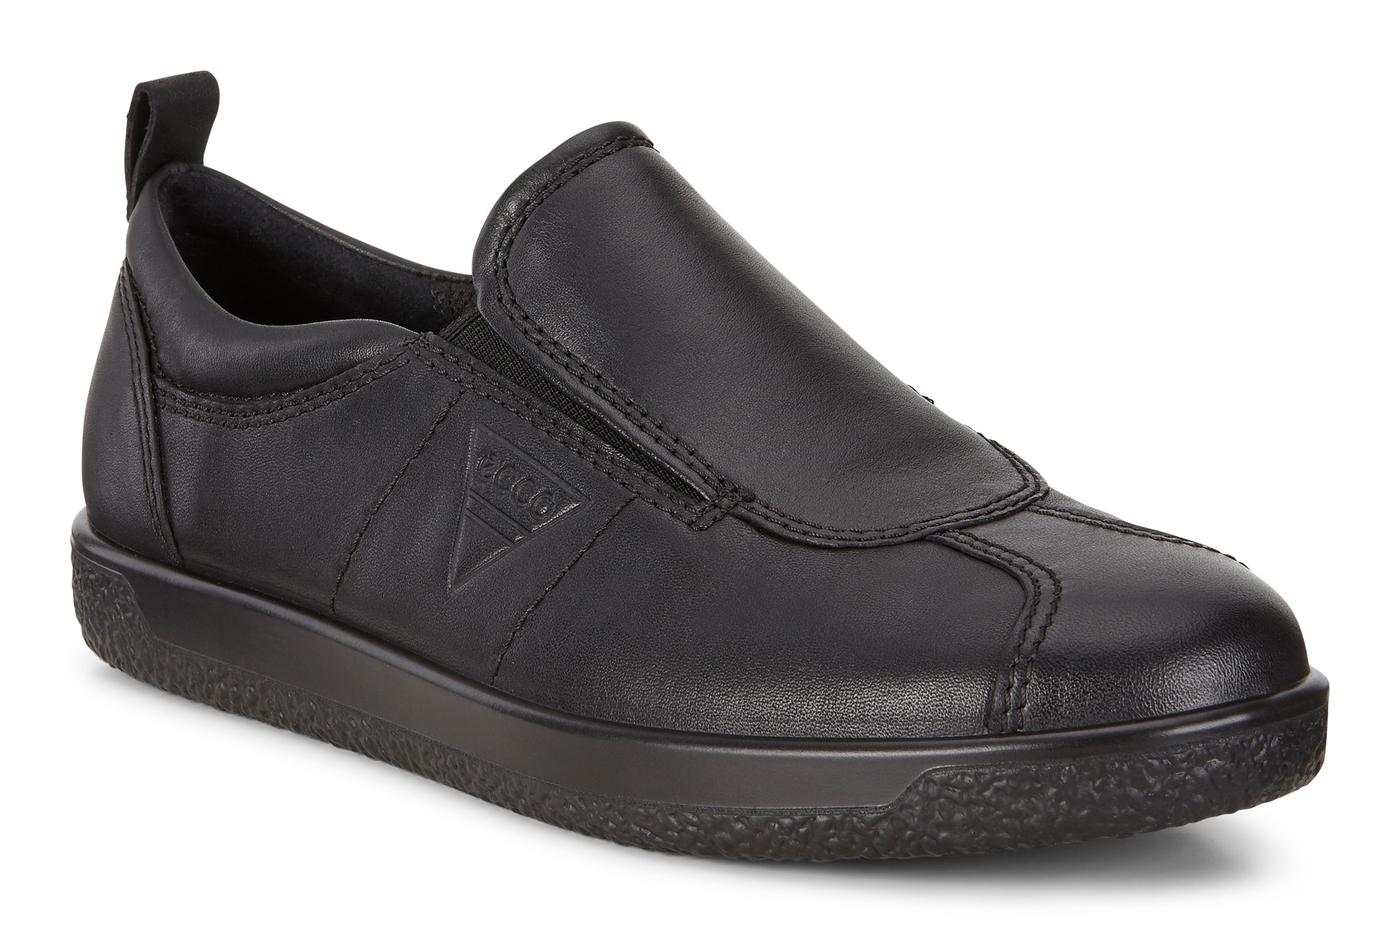 ECCO SOFT1 Ladies Sneaker Slip On